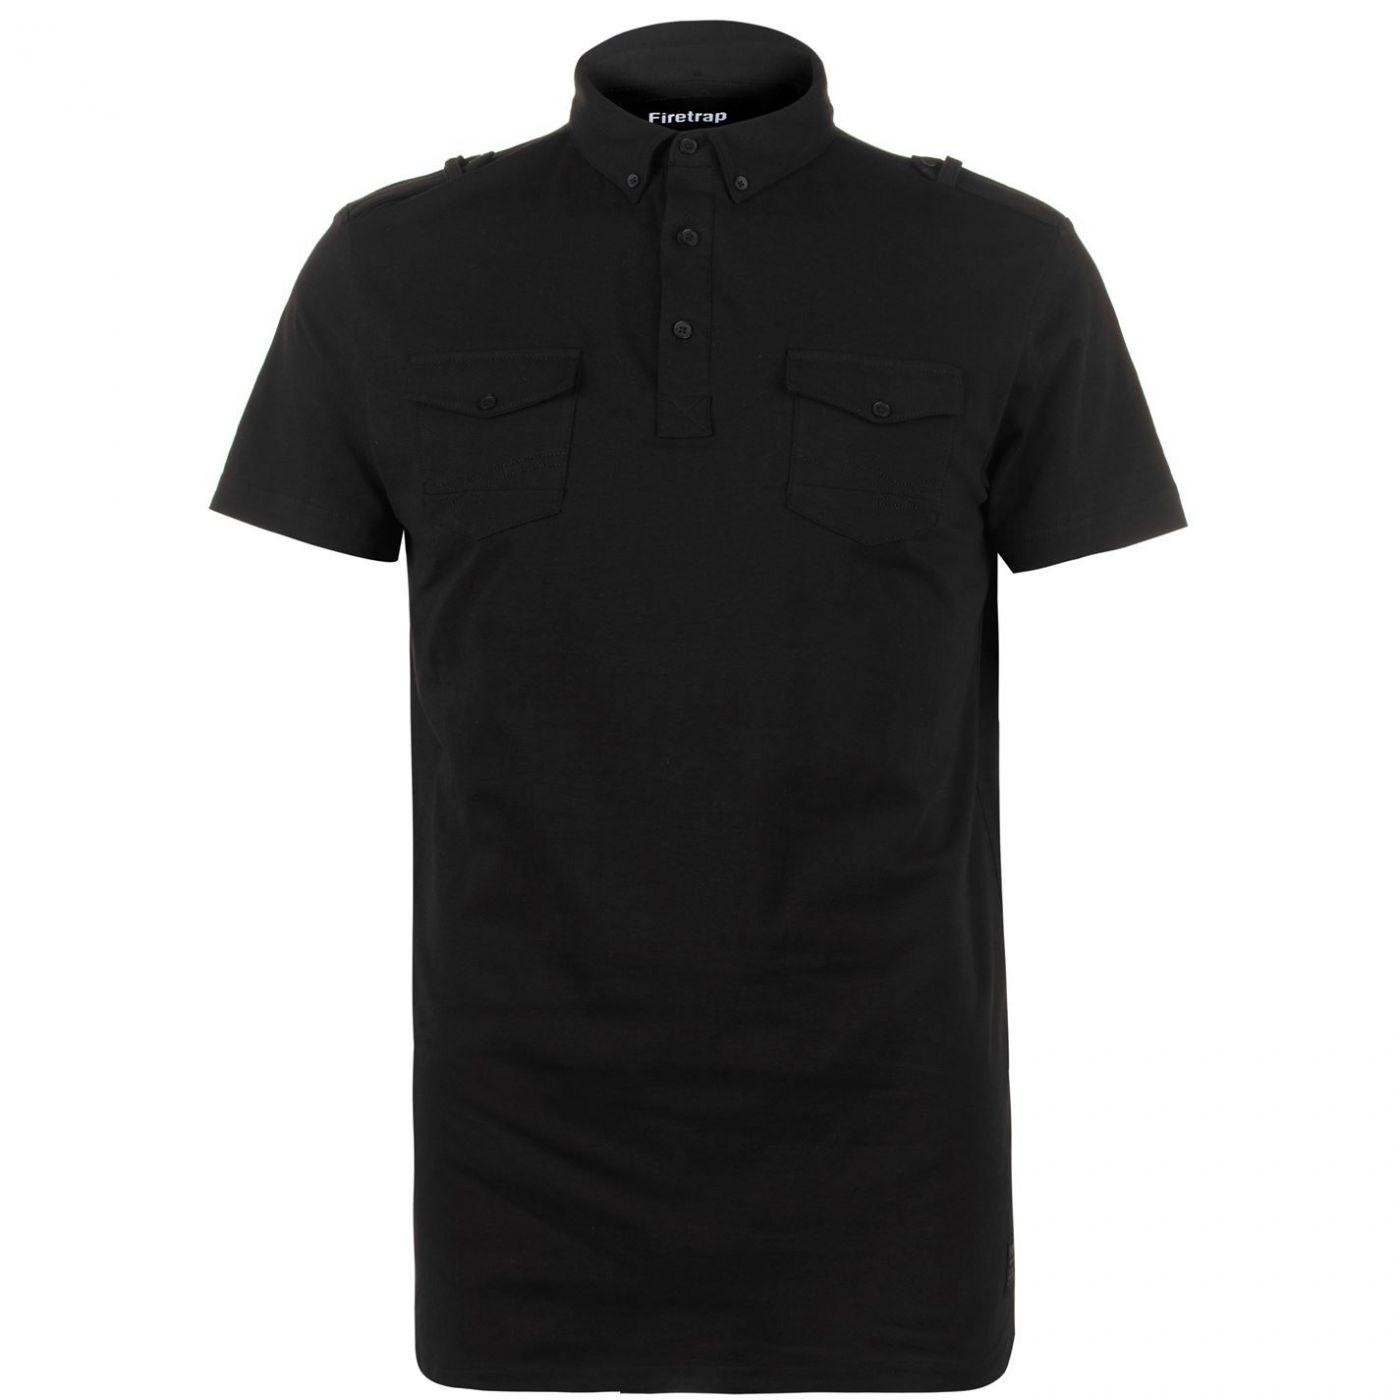 Firetrap Double Pocket Polo Shirt Mens